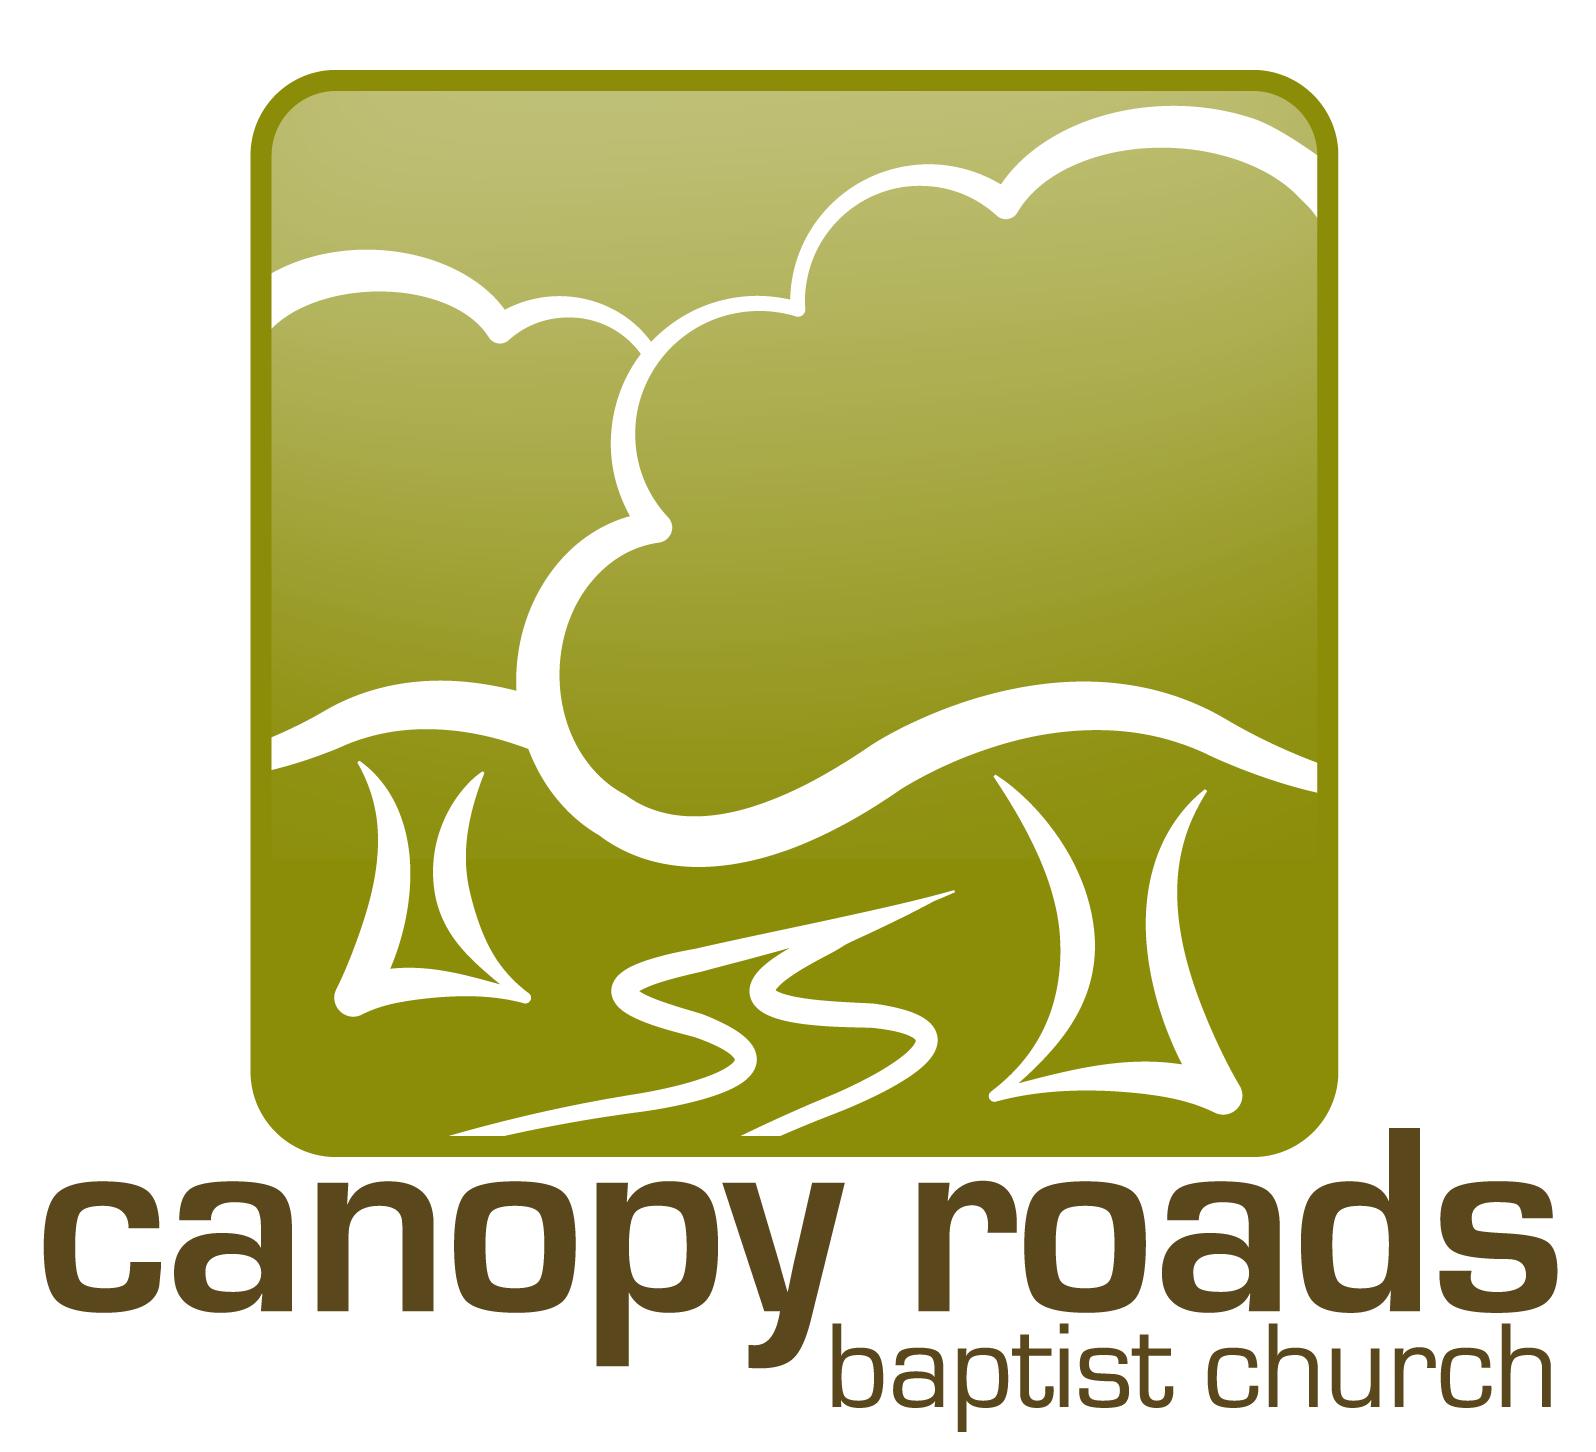 Canopy Roads Baptist Church